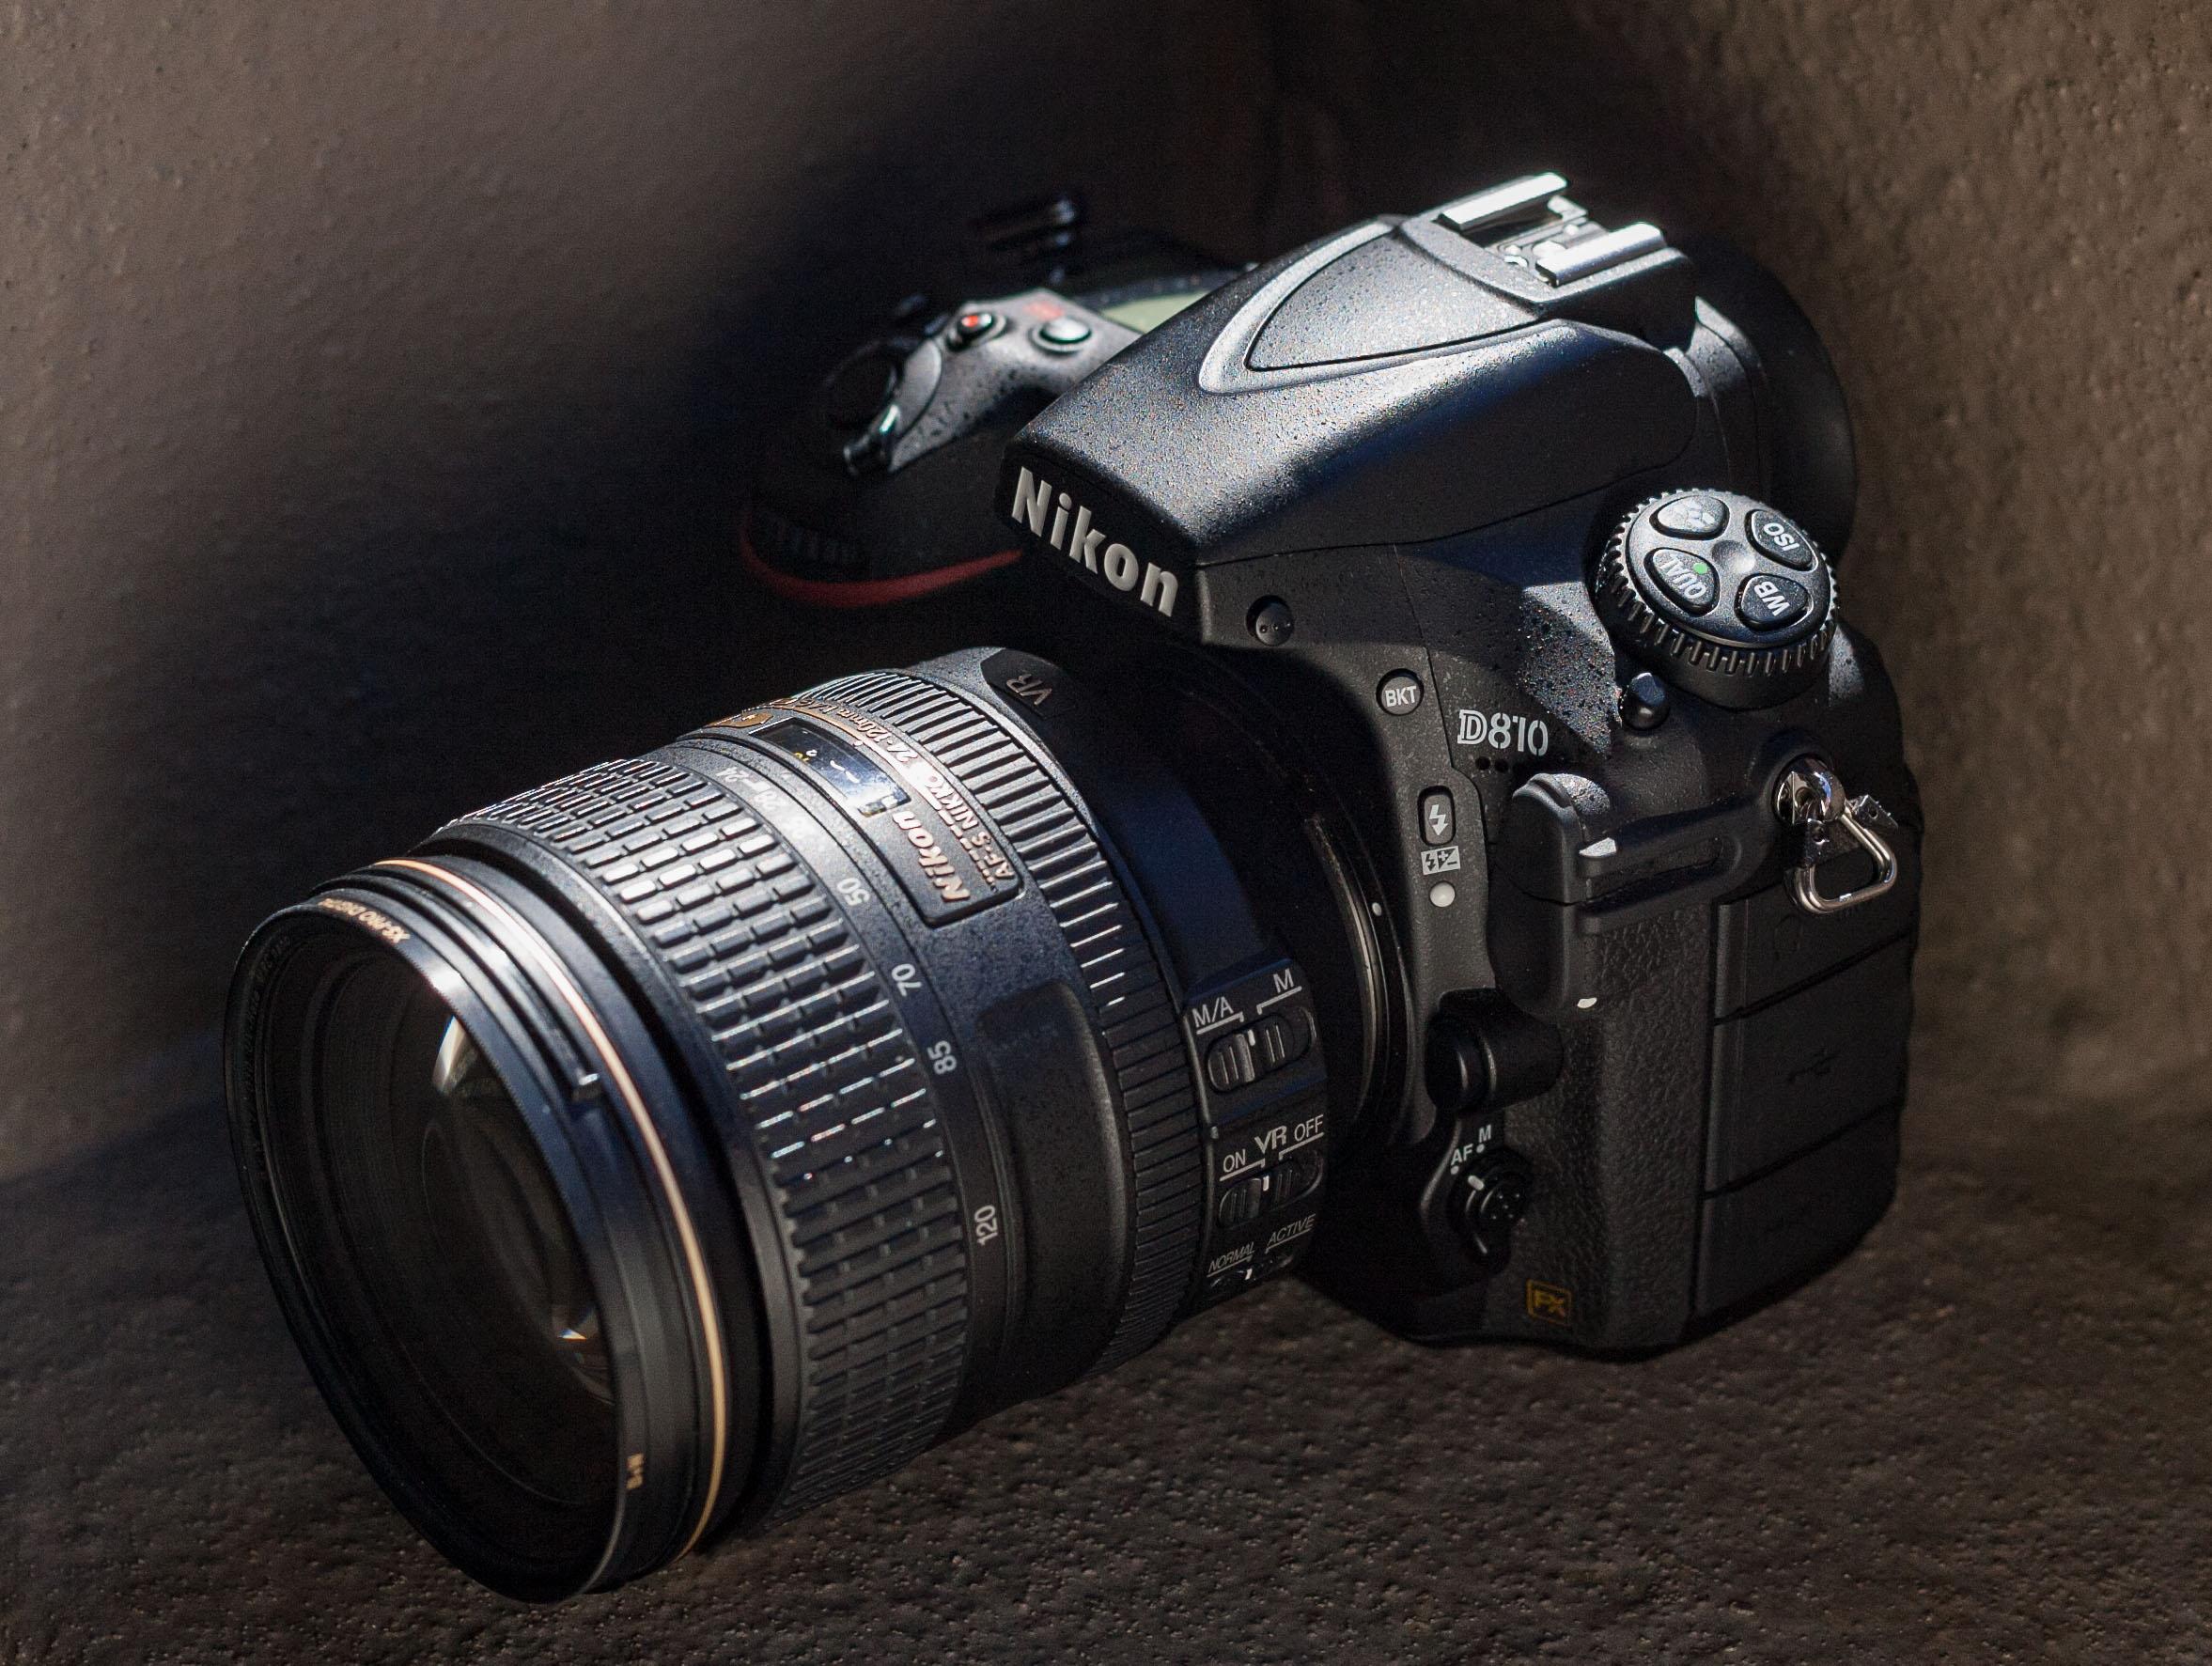 Benchmark Performance: Nikon D810 review: Digital